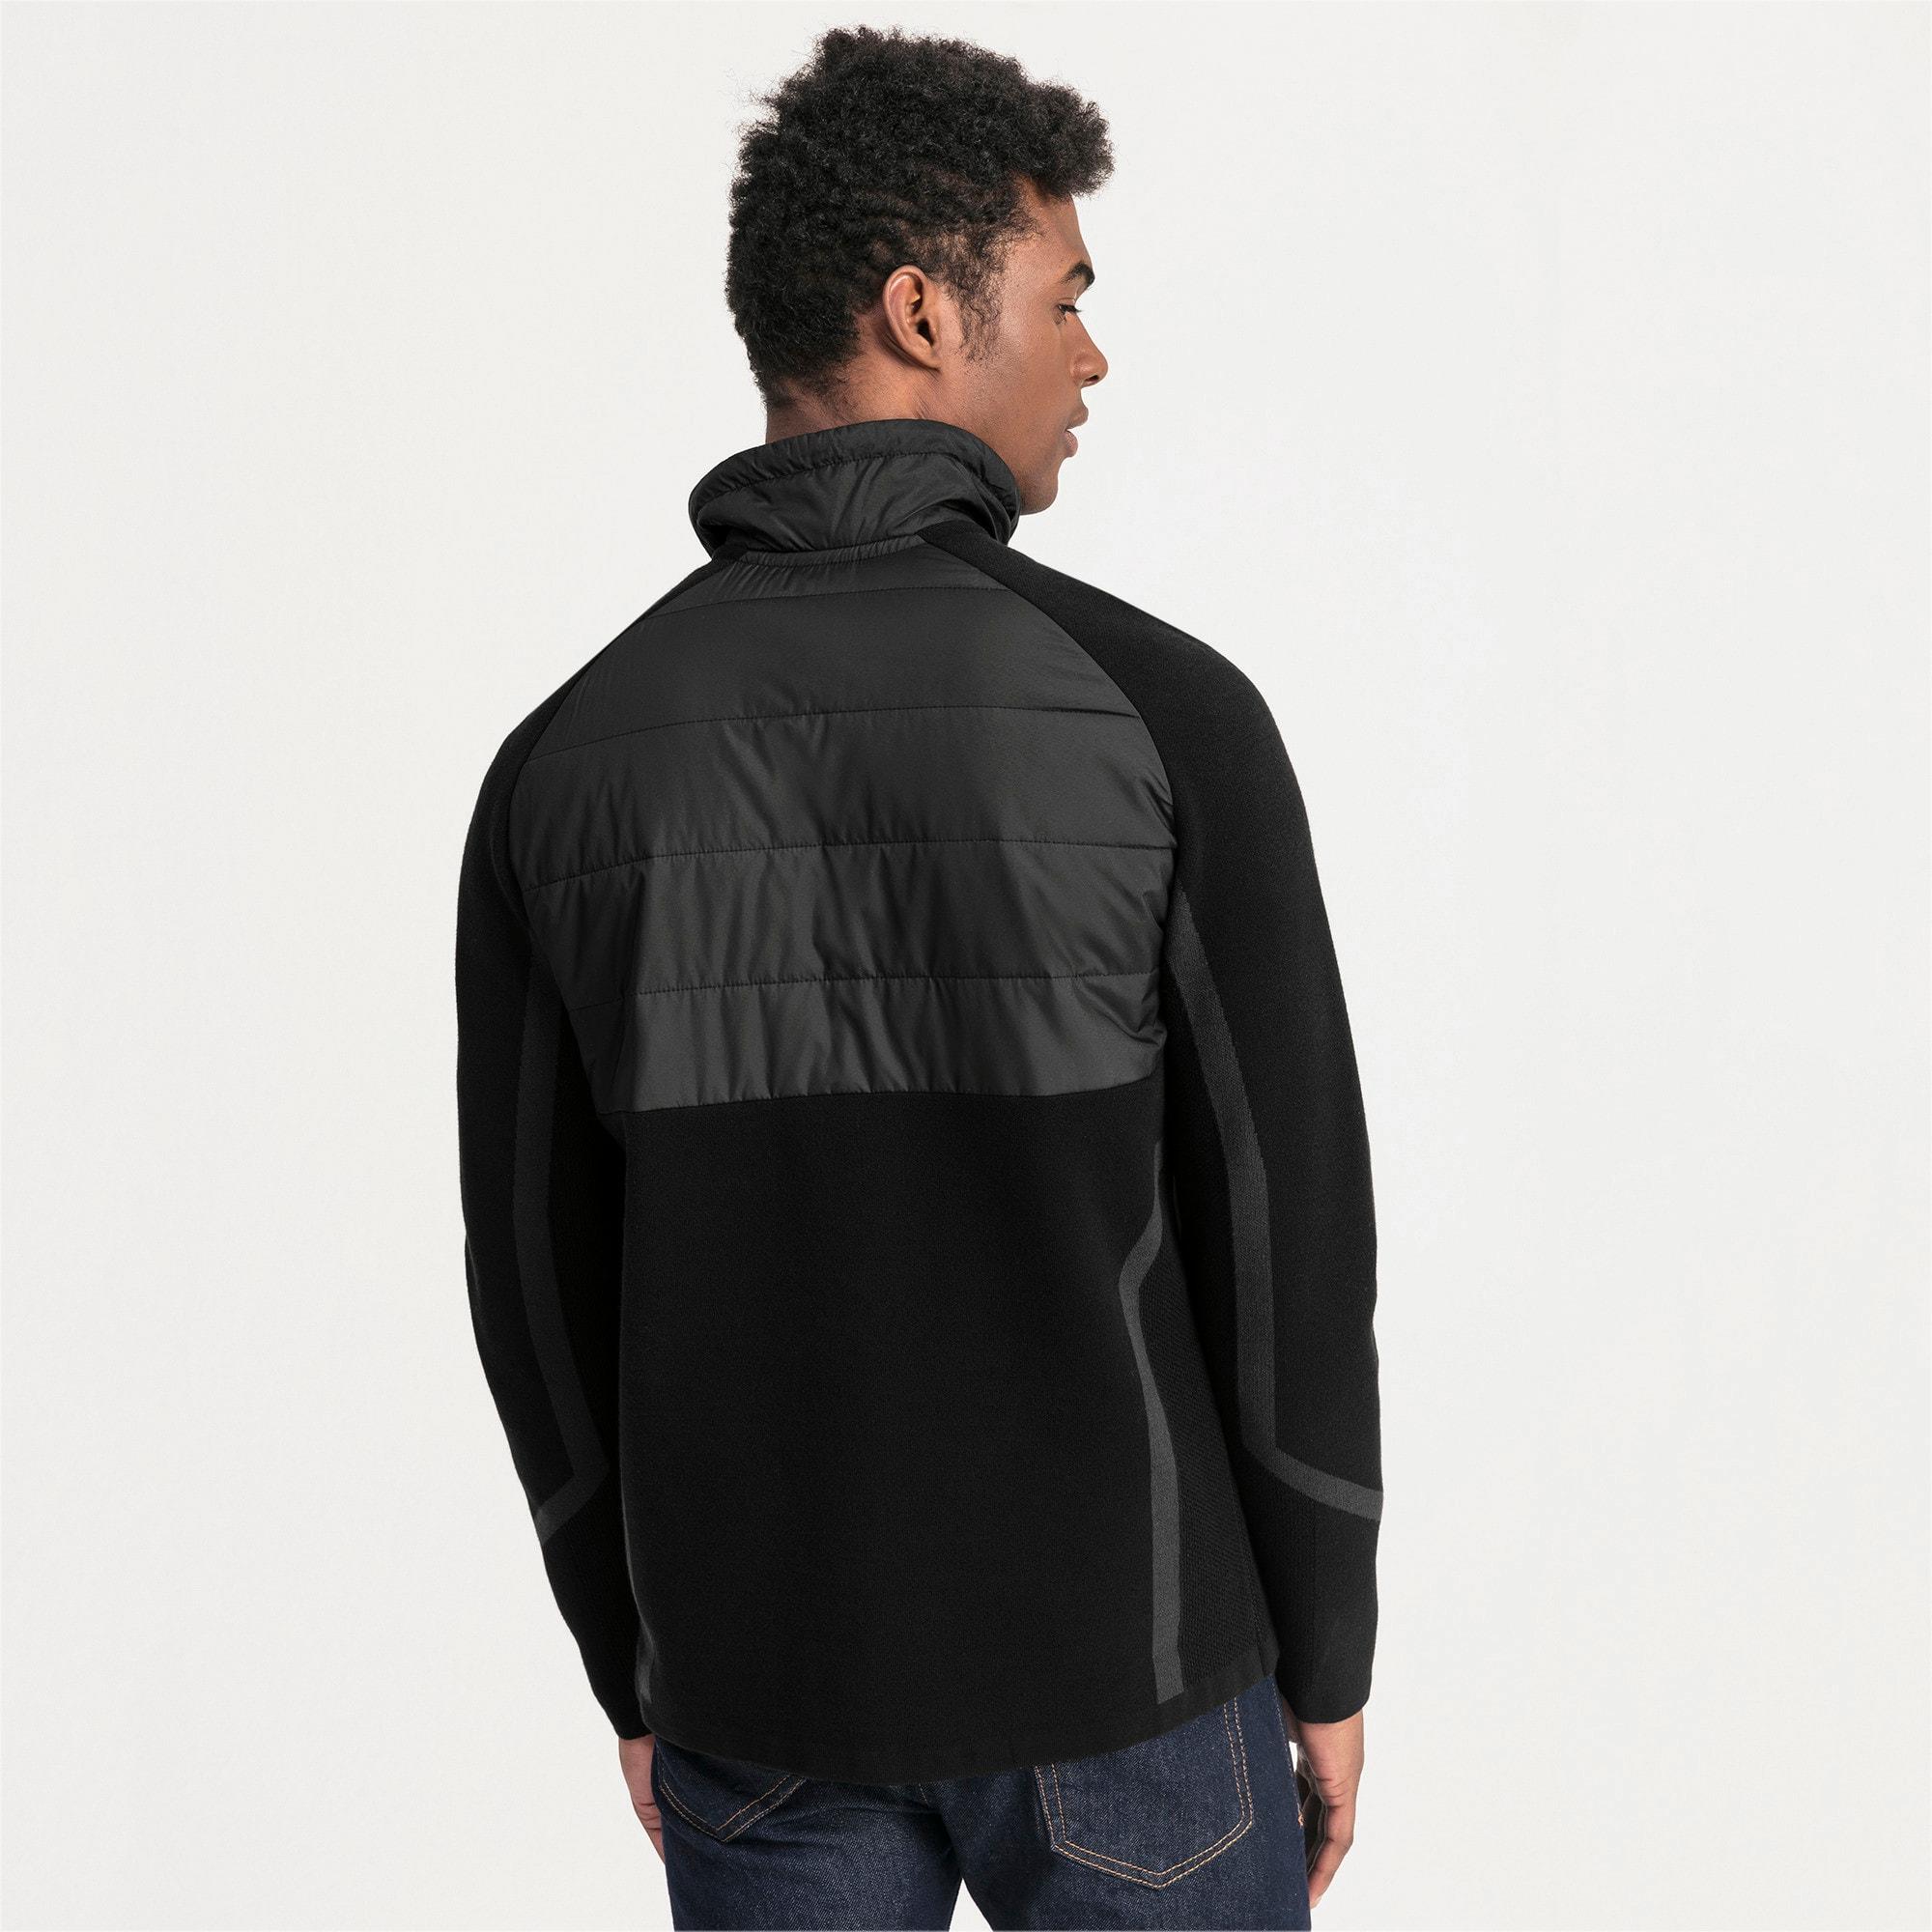 Thumbnail 2 of Mercedes AMG Petronas RCT evoKNIT Knitted Men's Sweater, Puma Black, medium